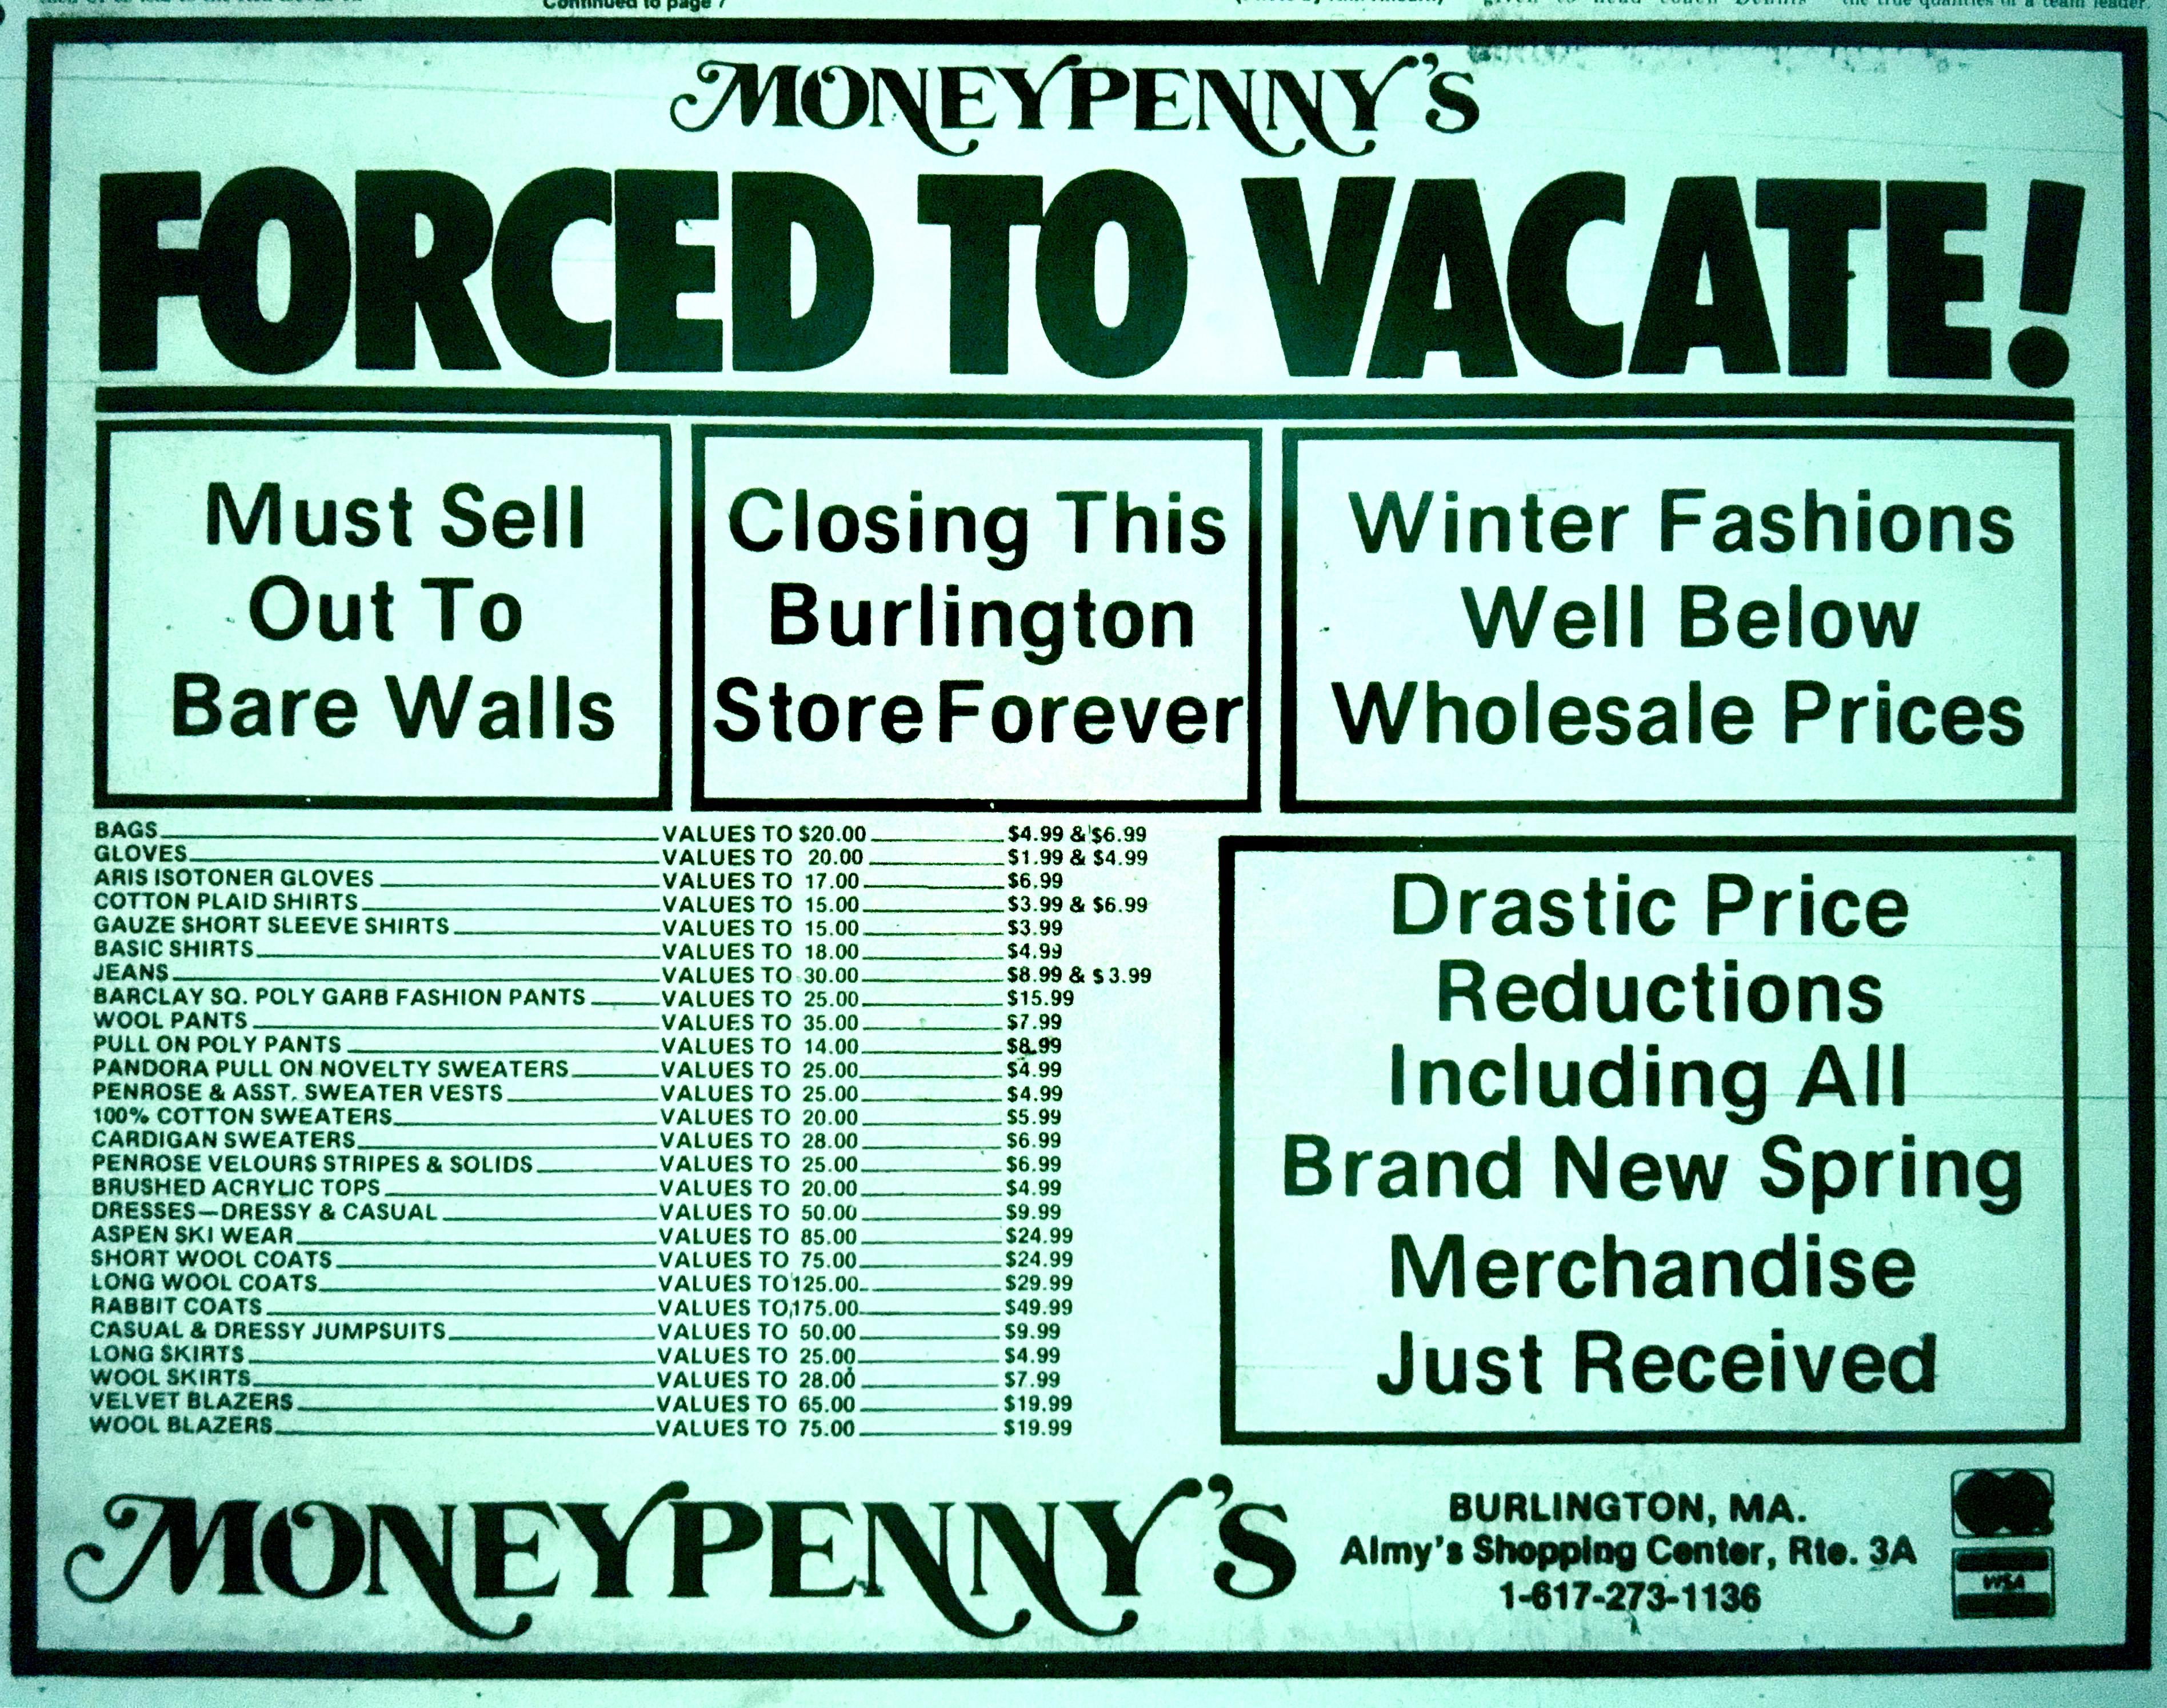 Moneypenny's closing sale